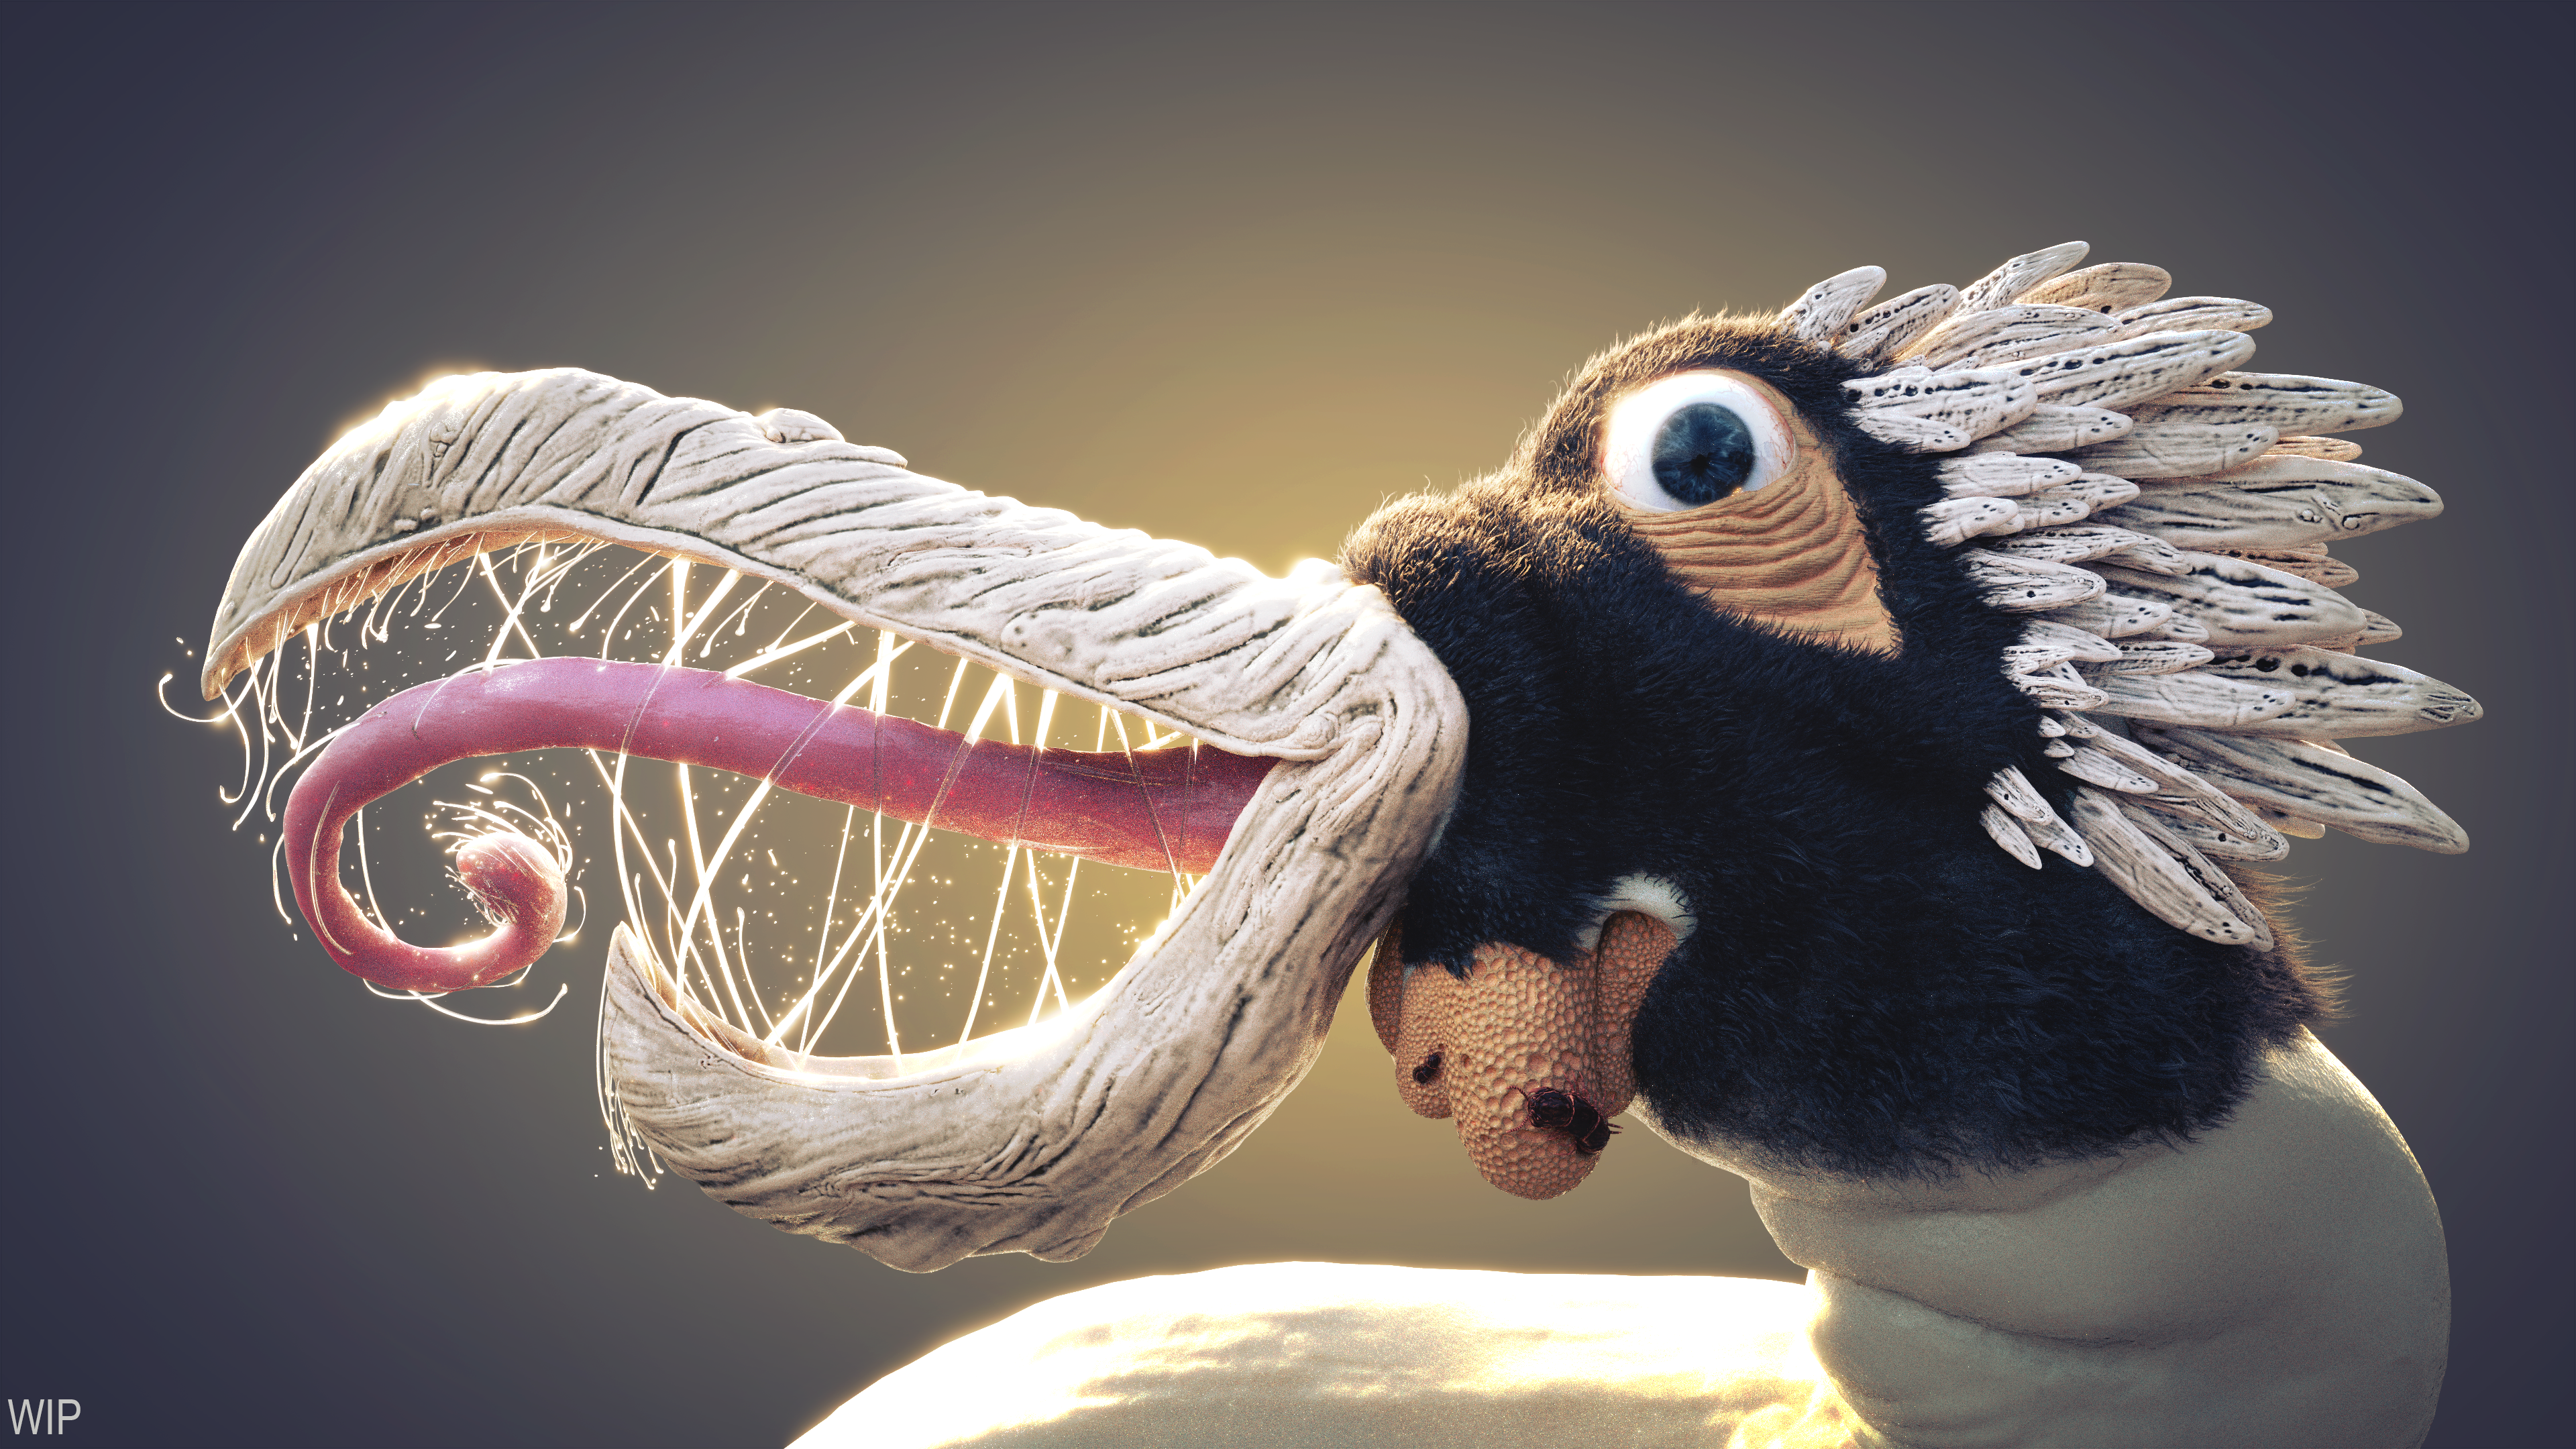 Birb WIP- Saliva, Centipedes, Fur, and Trypophobia by Shastro